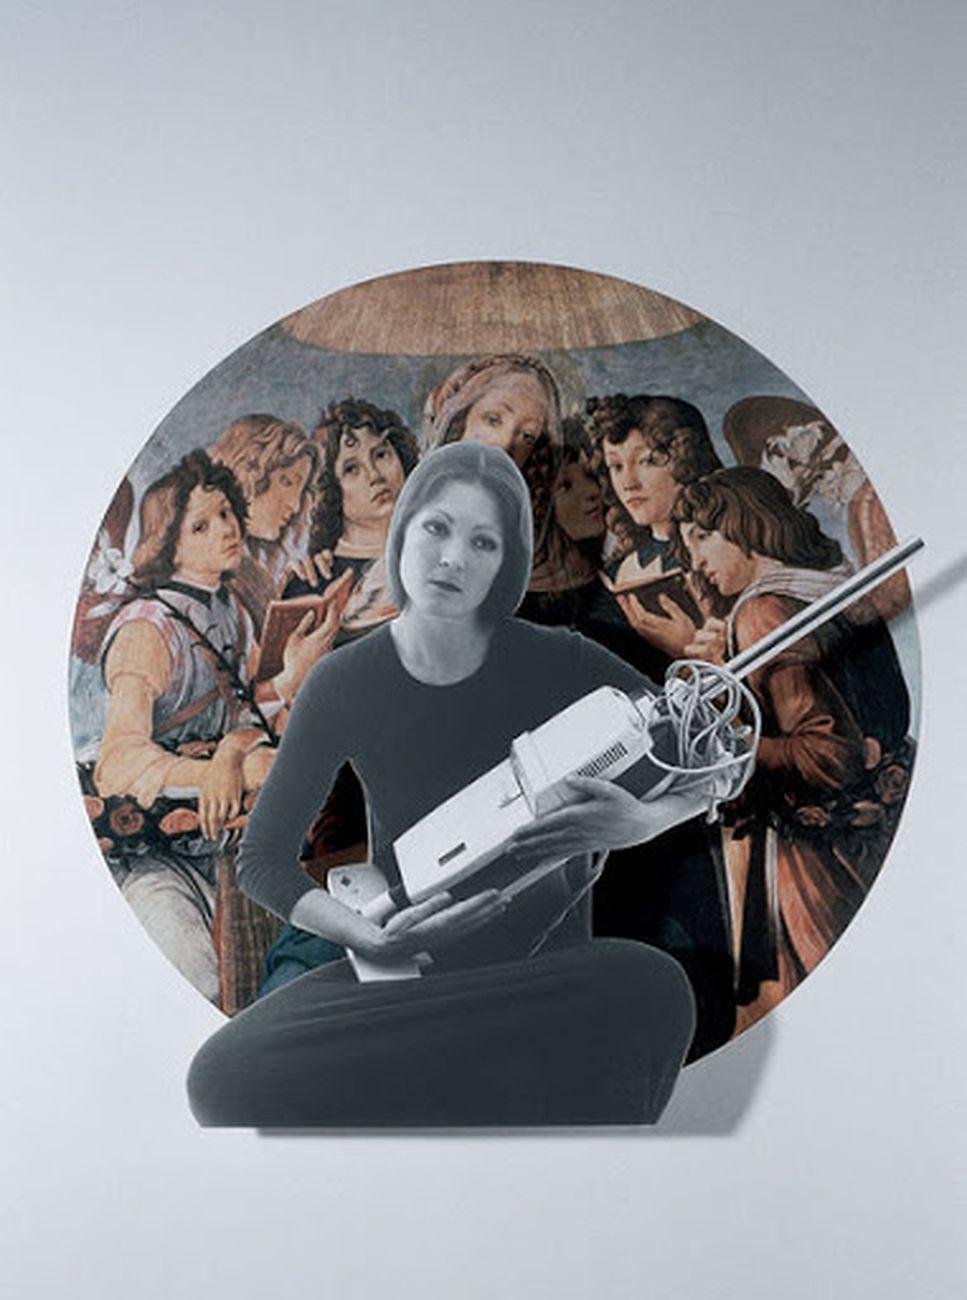 Valie Export, Aspettativa, 1976